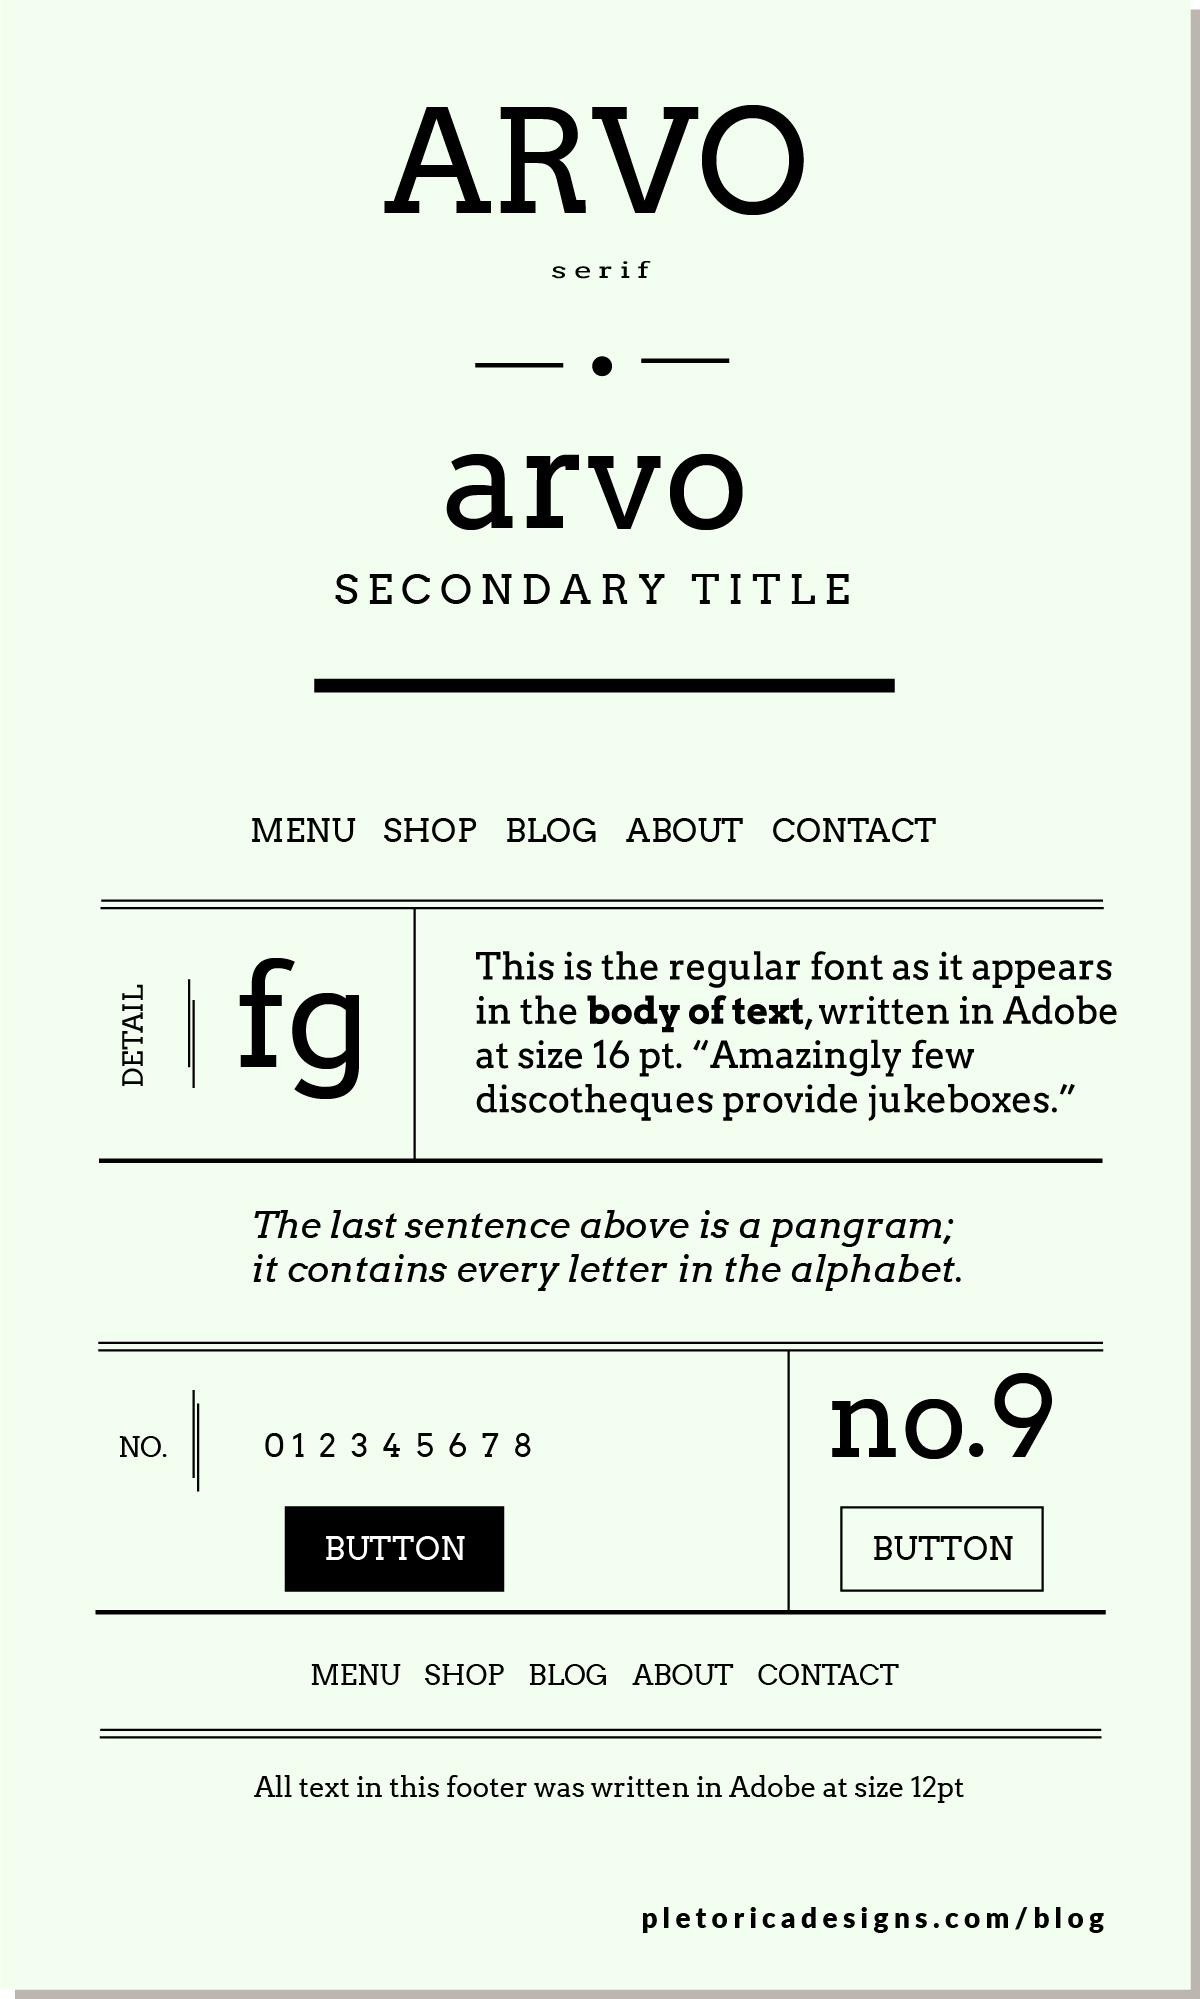 LET'S TYPE: Arvo — PLETÓRICA DESIGNS